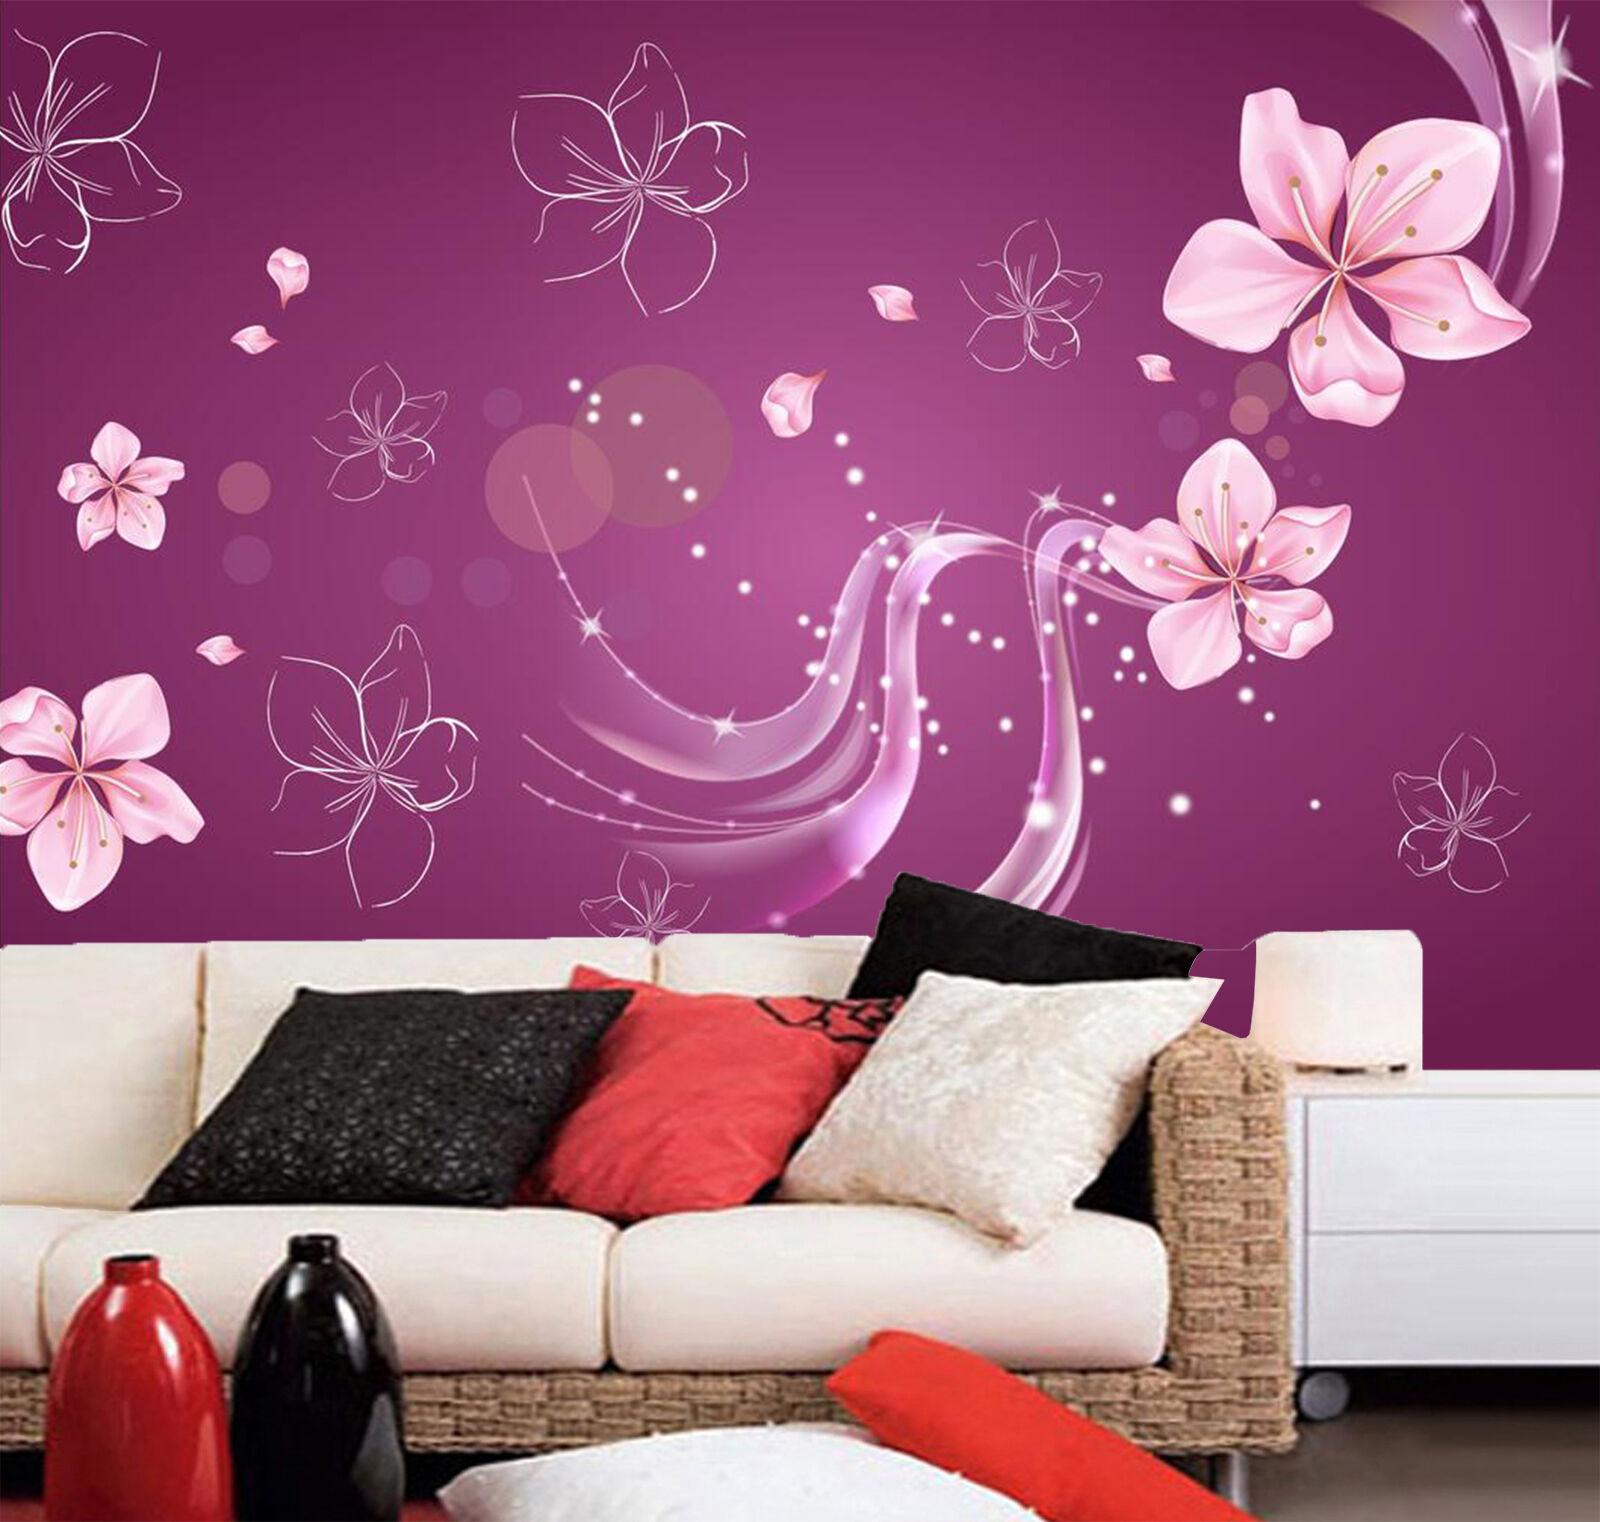 3D Lila Blüten, Farbe 634 Fototapeten Wandbild Fototapete BildTapete Familie